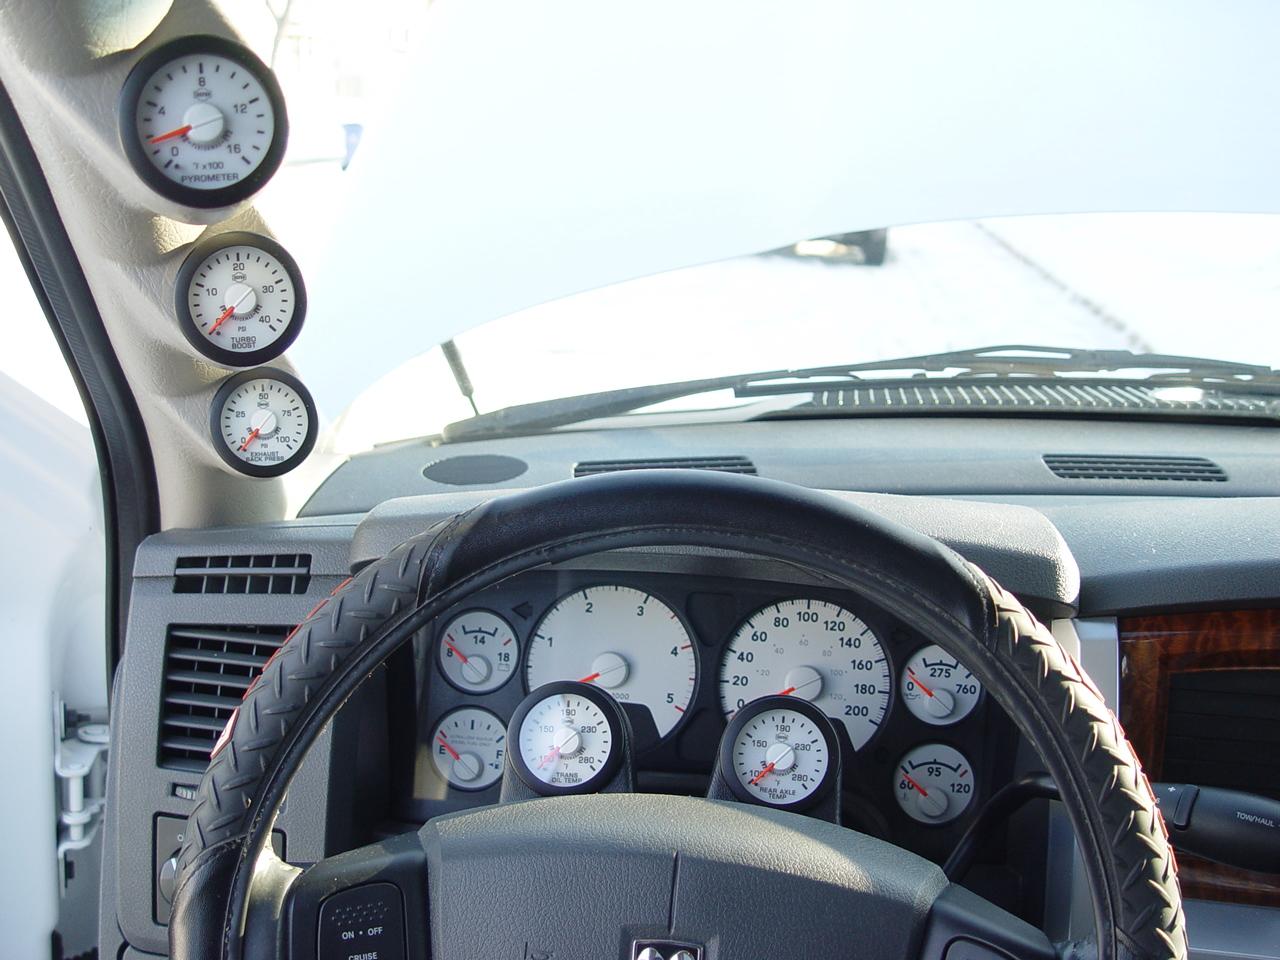 15w40 Diesel Oil >> Show us your gauge set ups - Page 2 - Dodge Cummins Diesel Forum